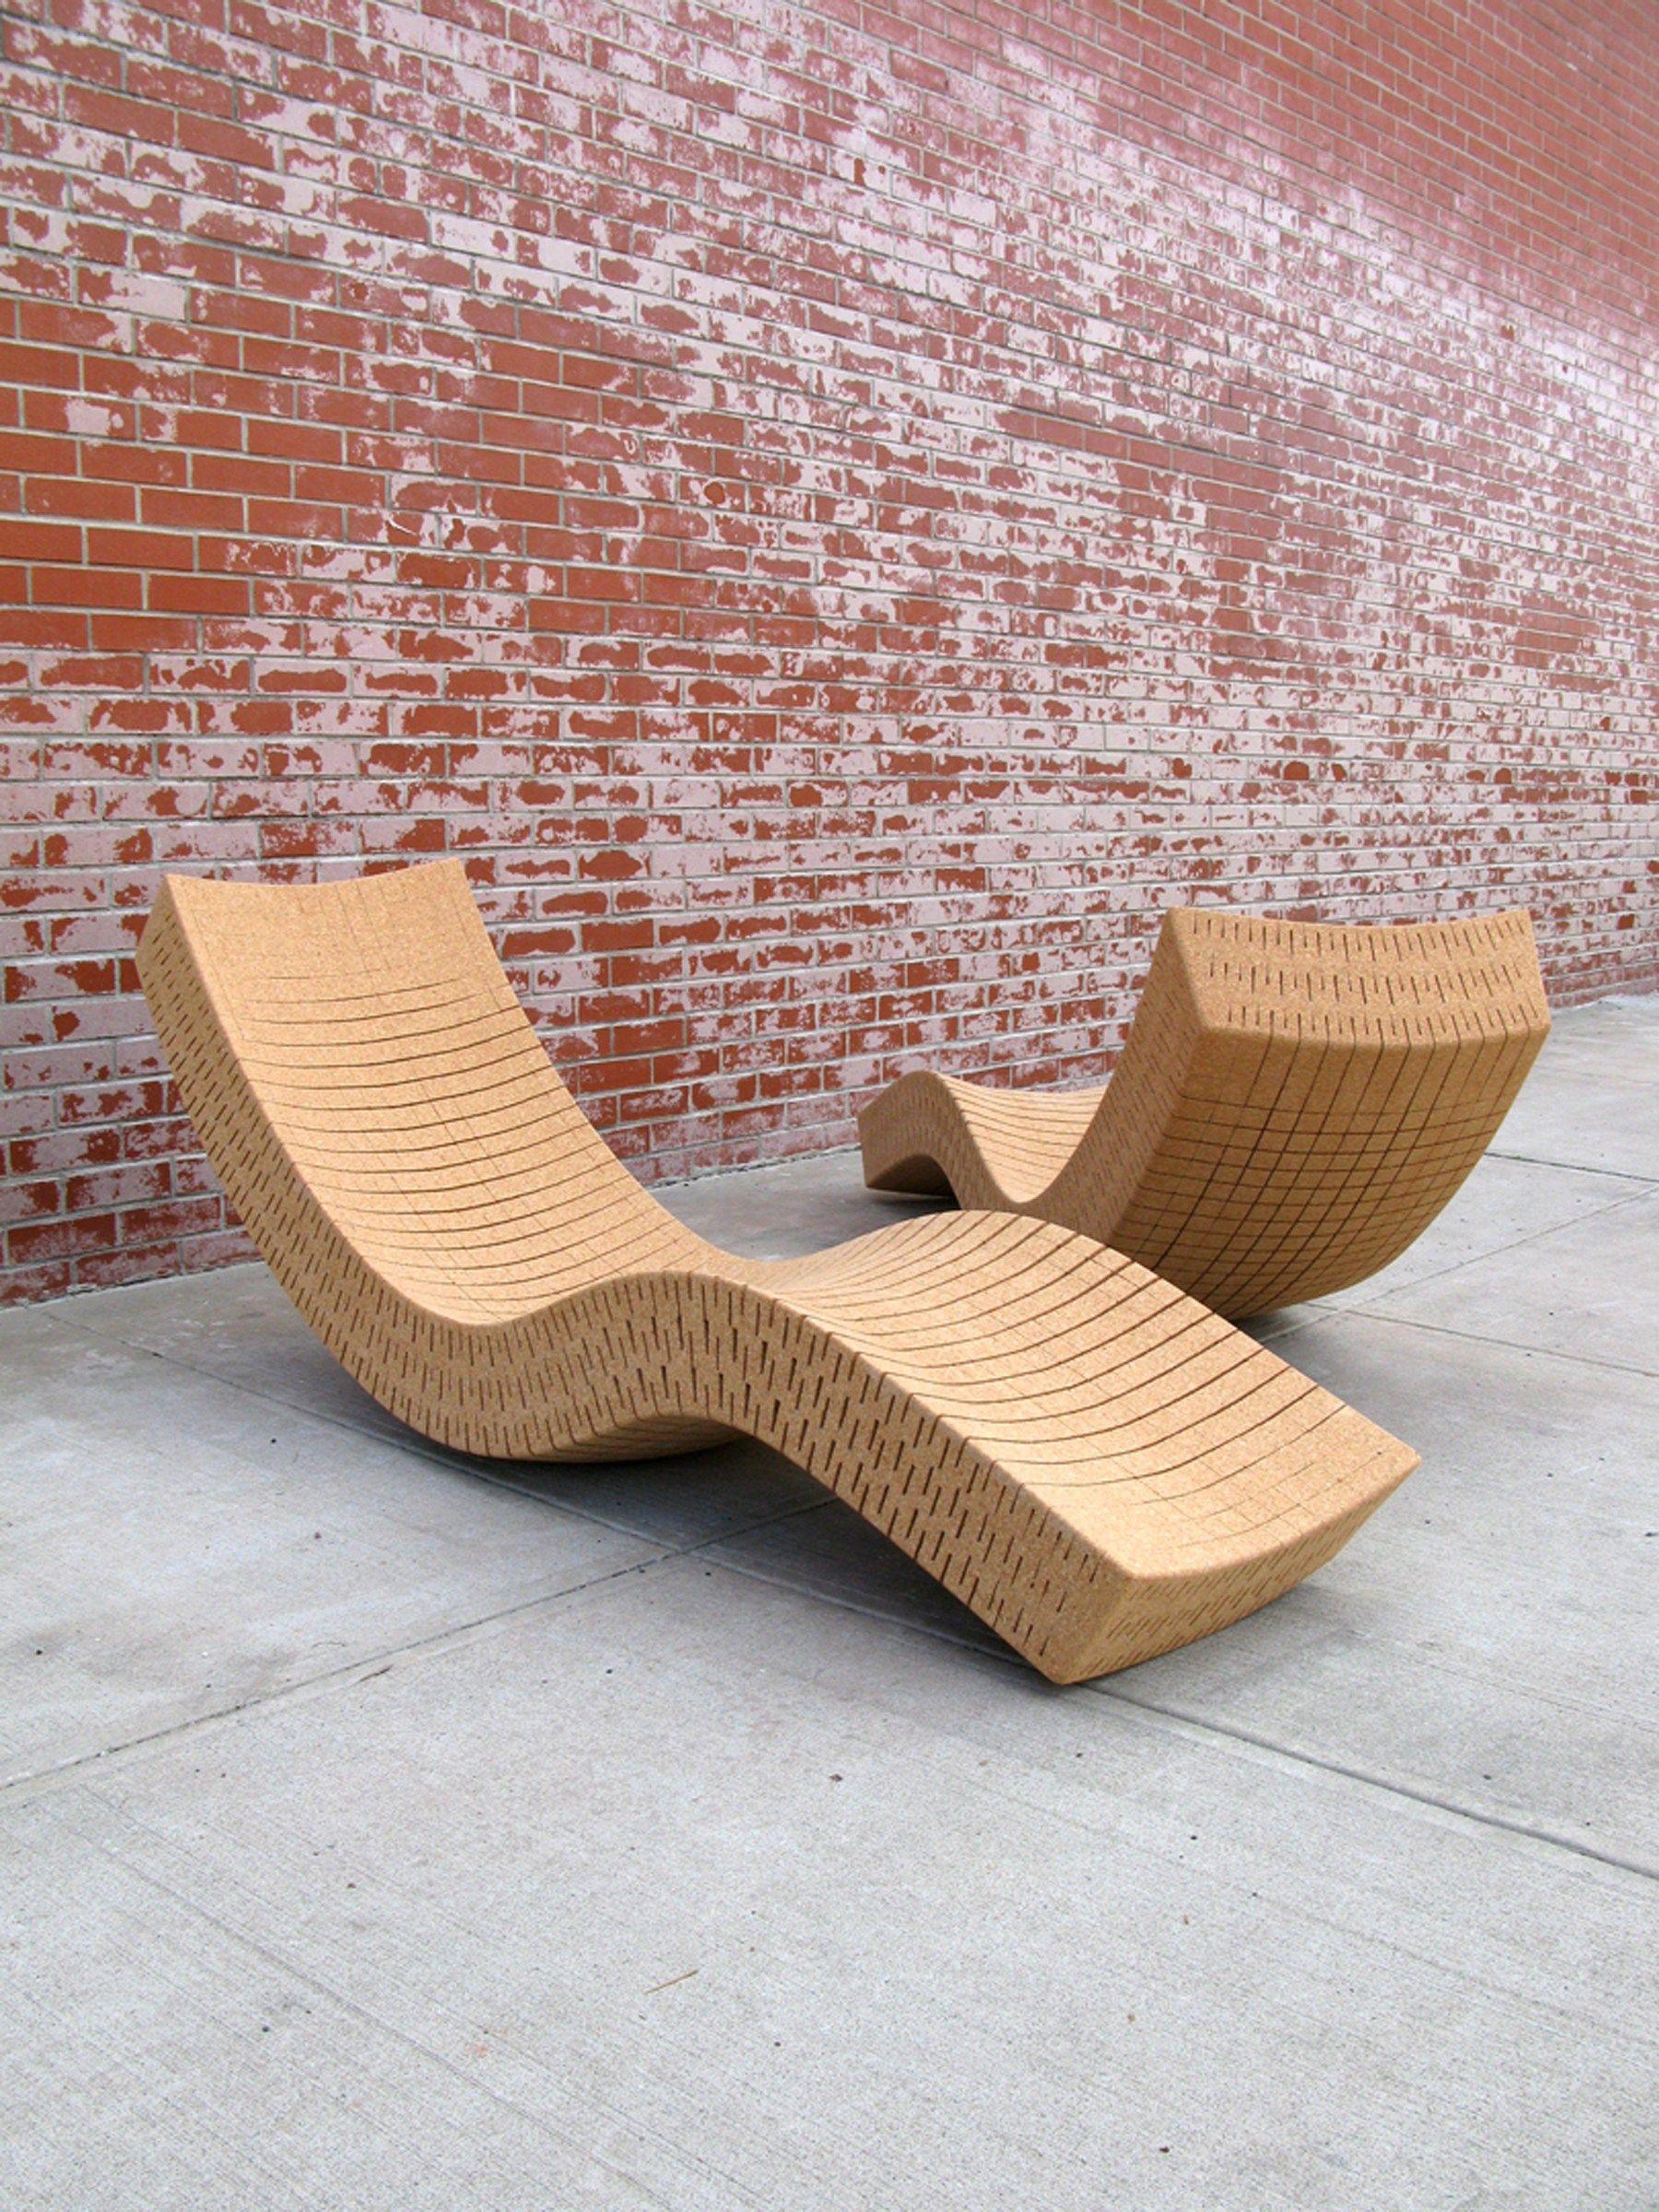 chaiselongue aus kork cortiÇa - daniel michalik furniture design, Möbel